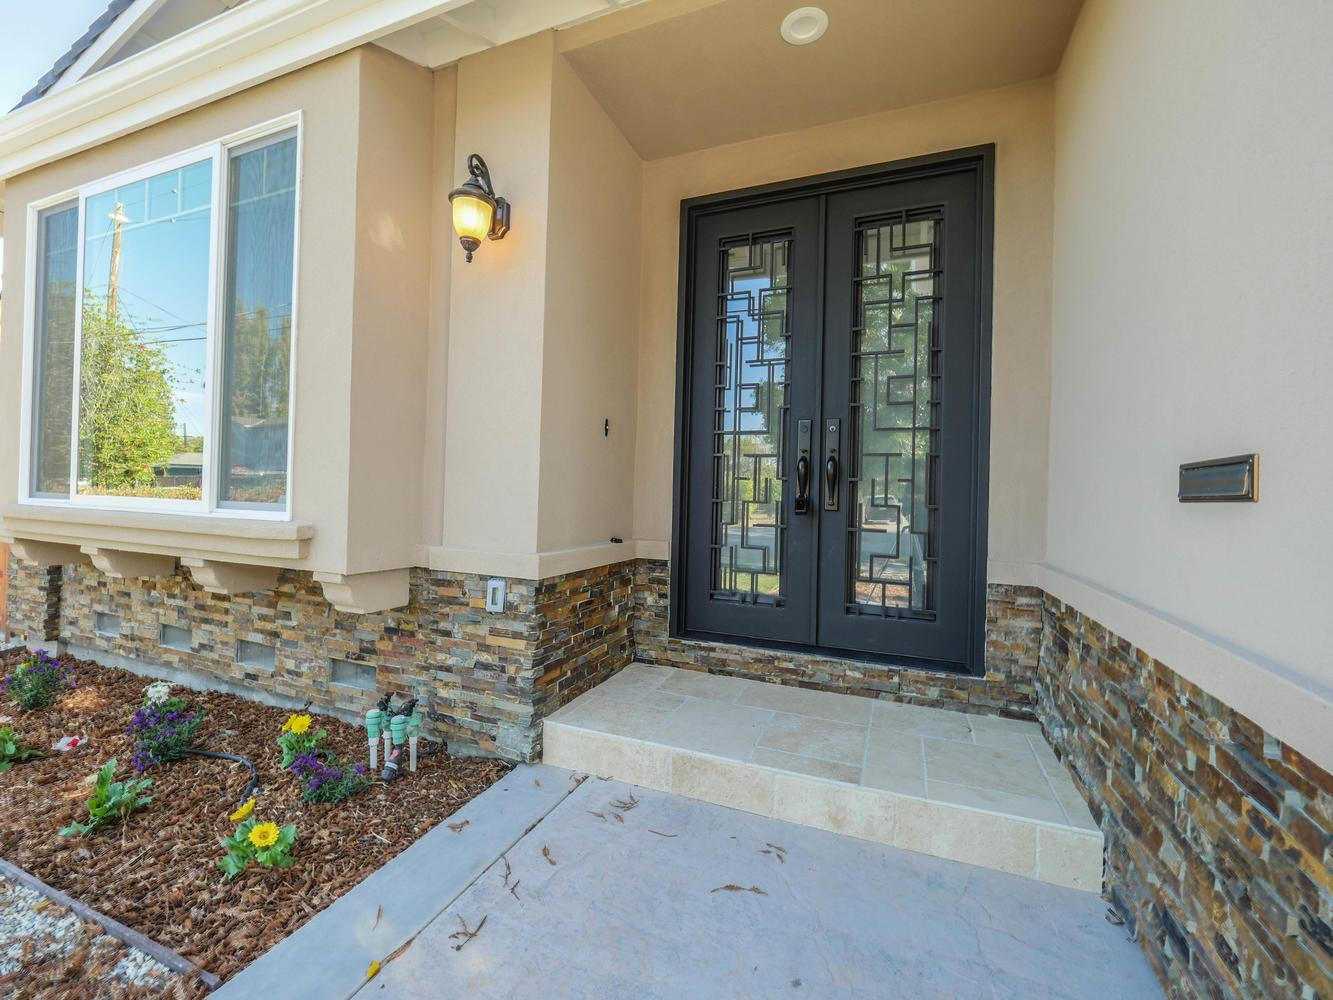 392 Stowell Avenue, Sunnyvale, CA 94085